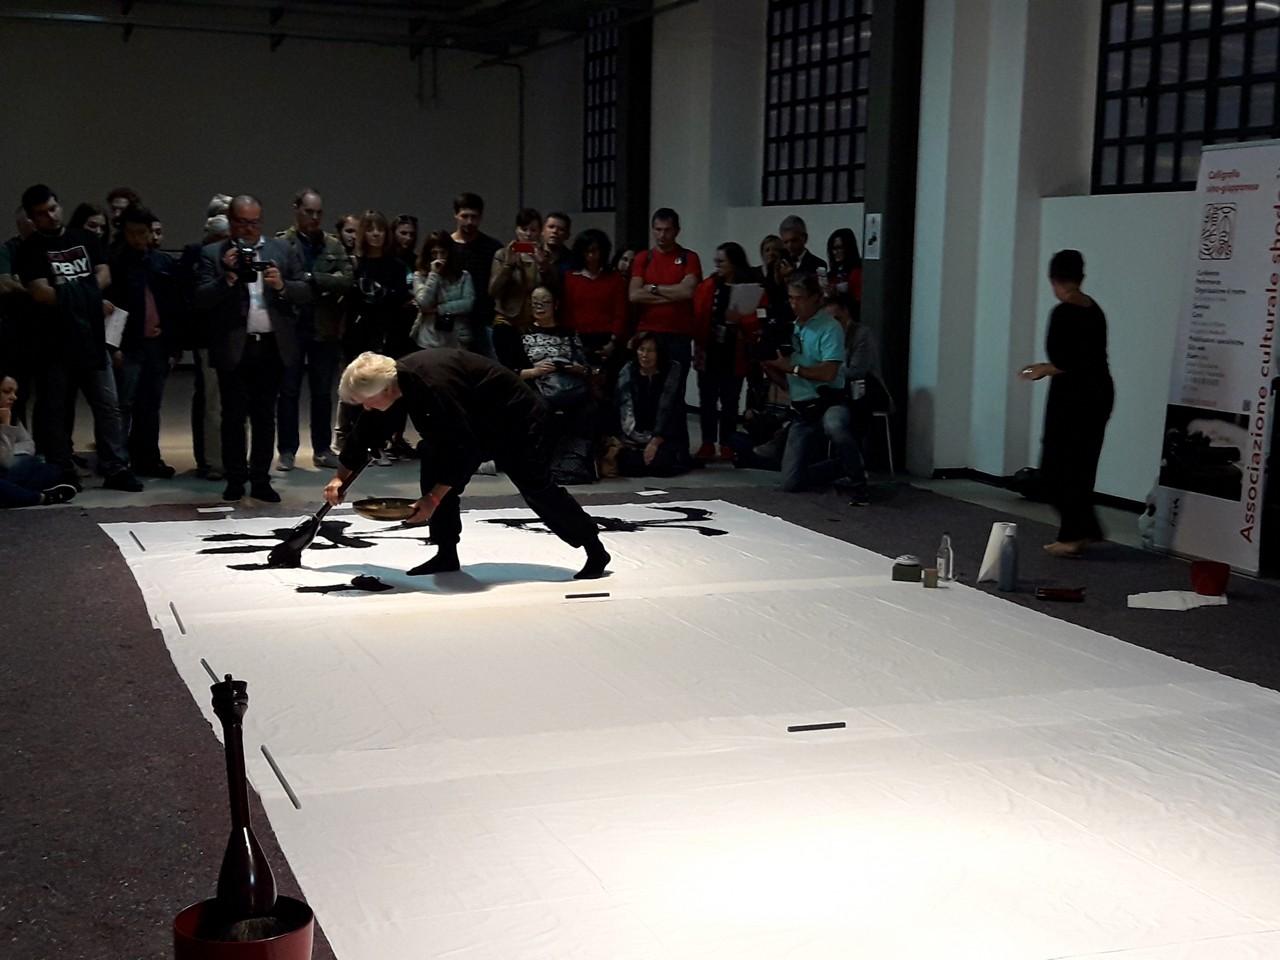 JapanFestival-Milano2018-fotoPagineZeni_012